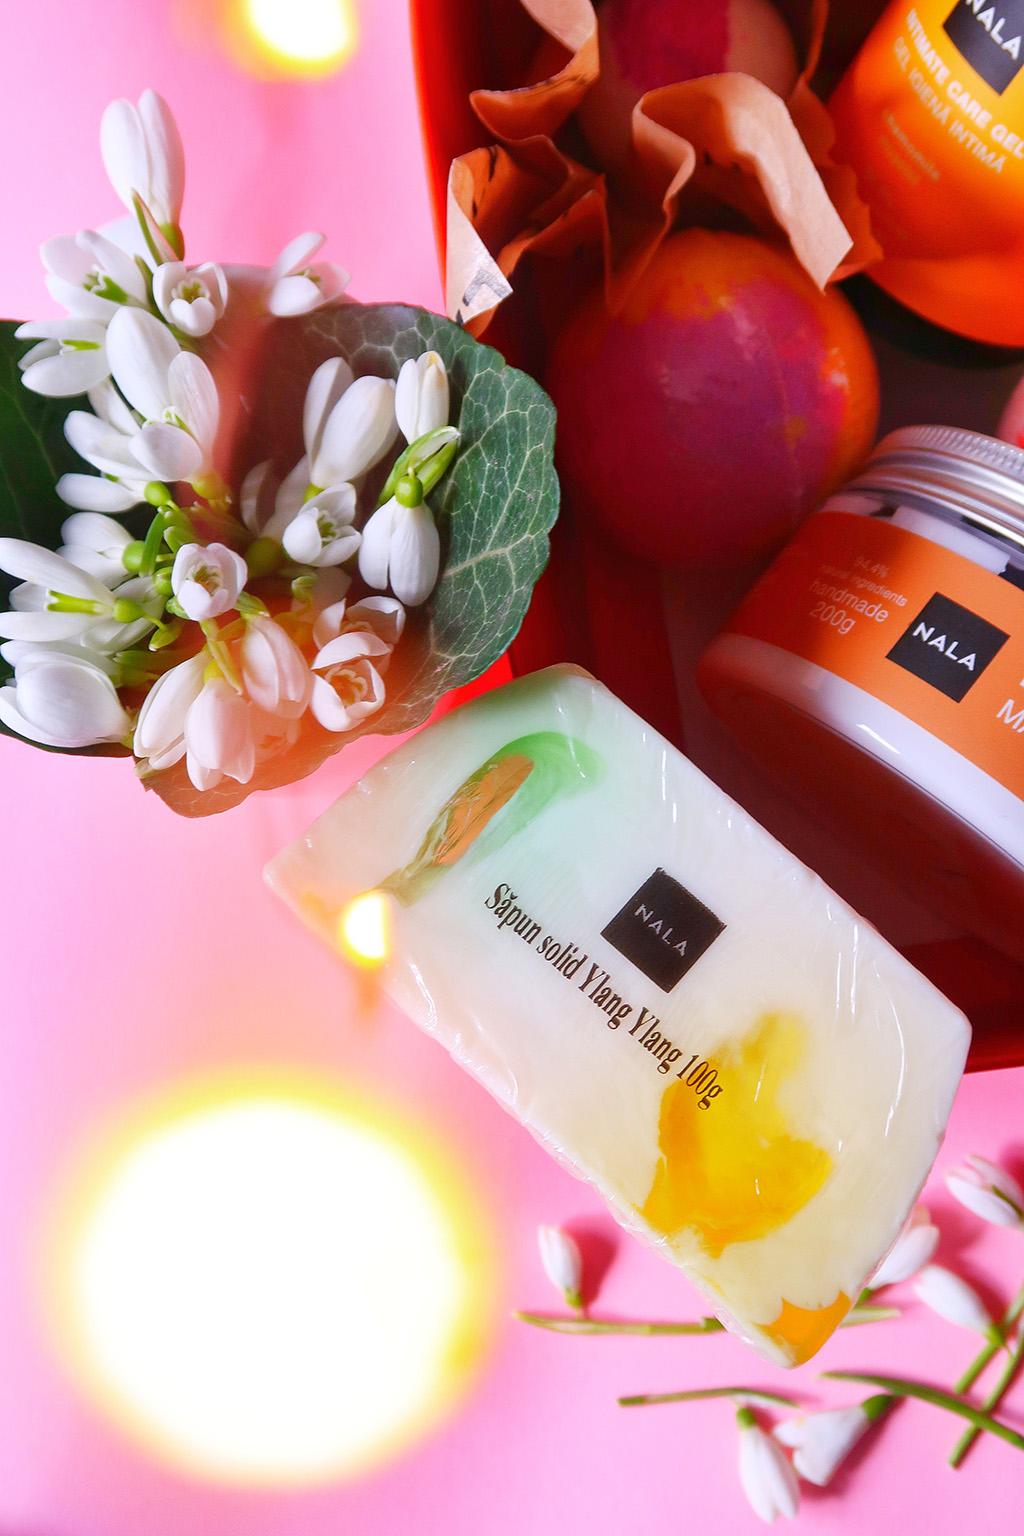 nala un cadou aromat valentine's day dragobete bombe baie gel dus intim sapun maini ingredinete naturale